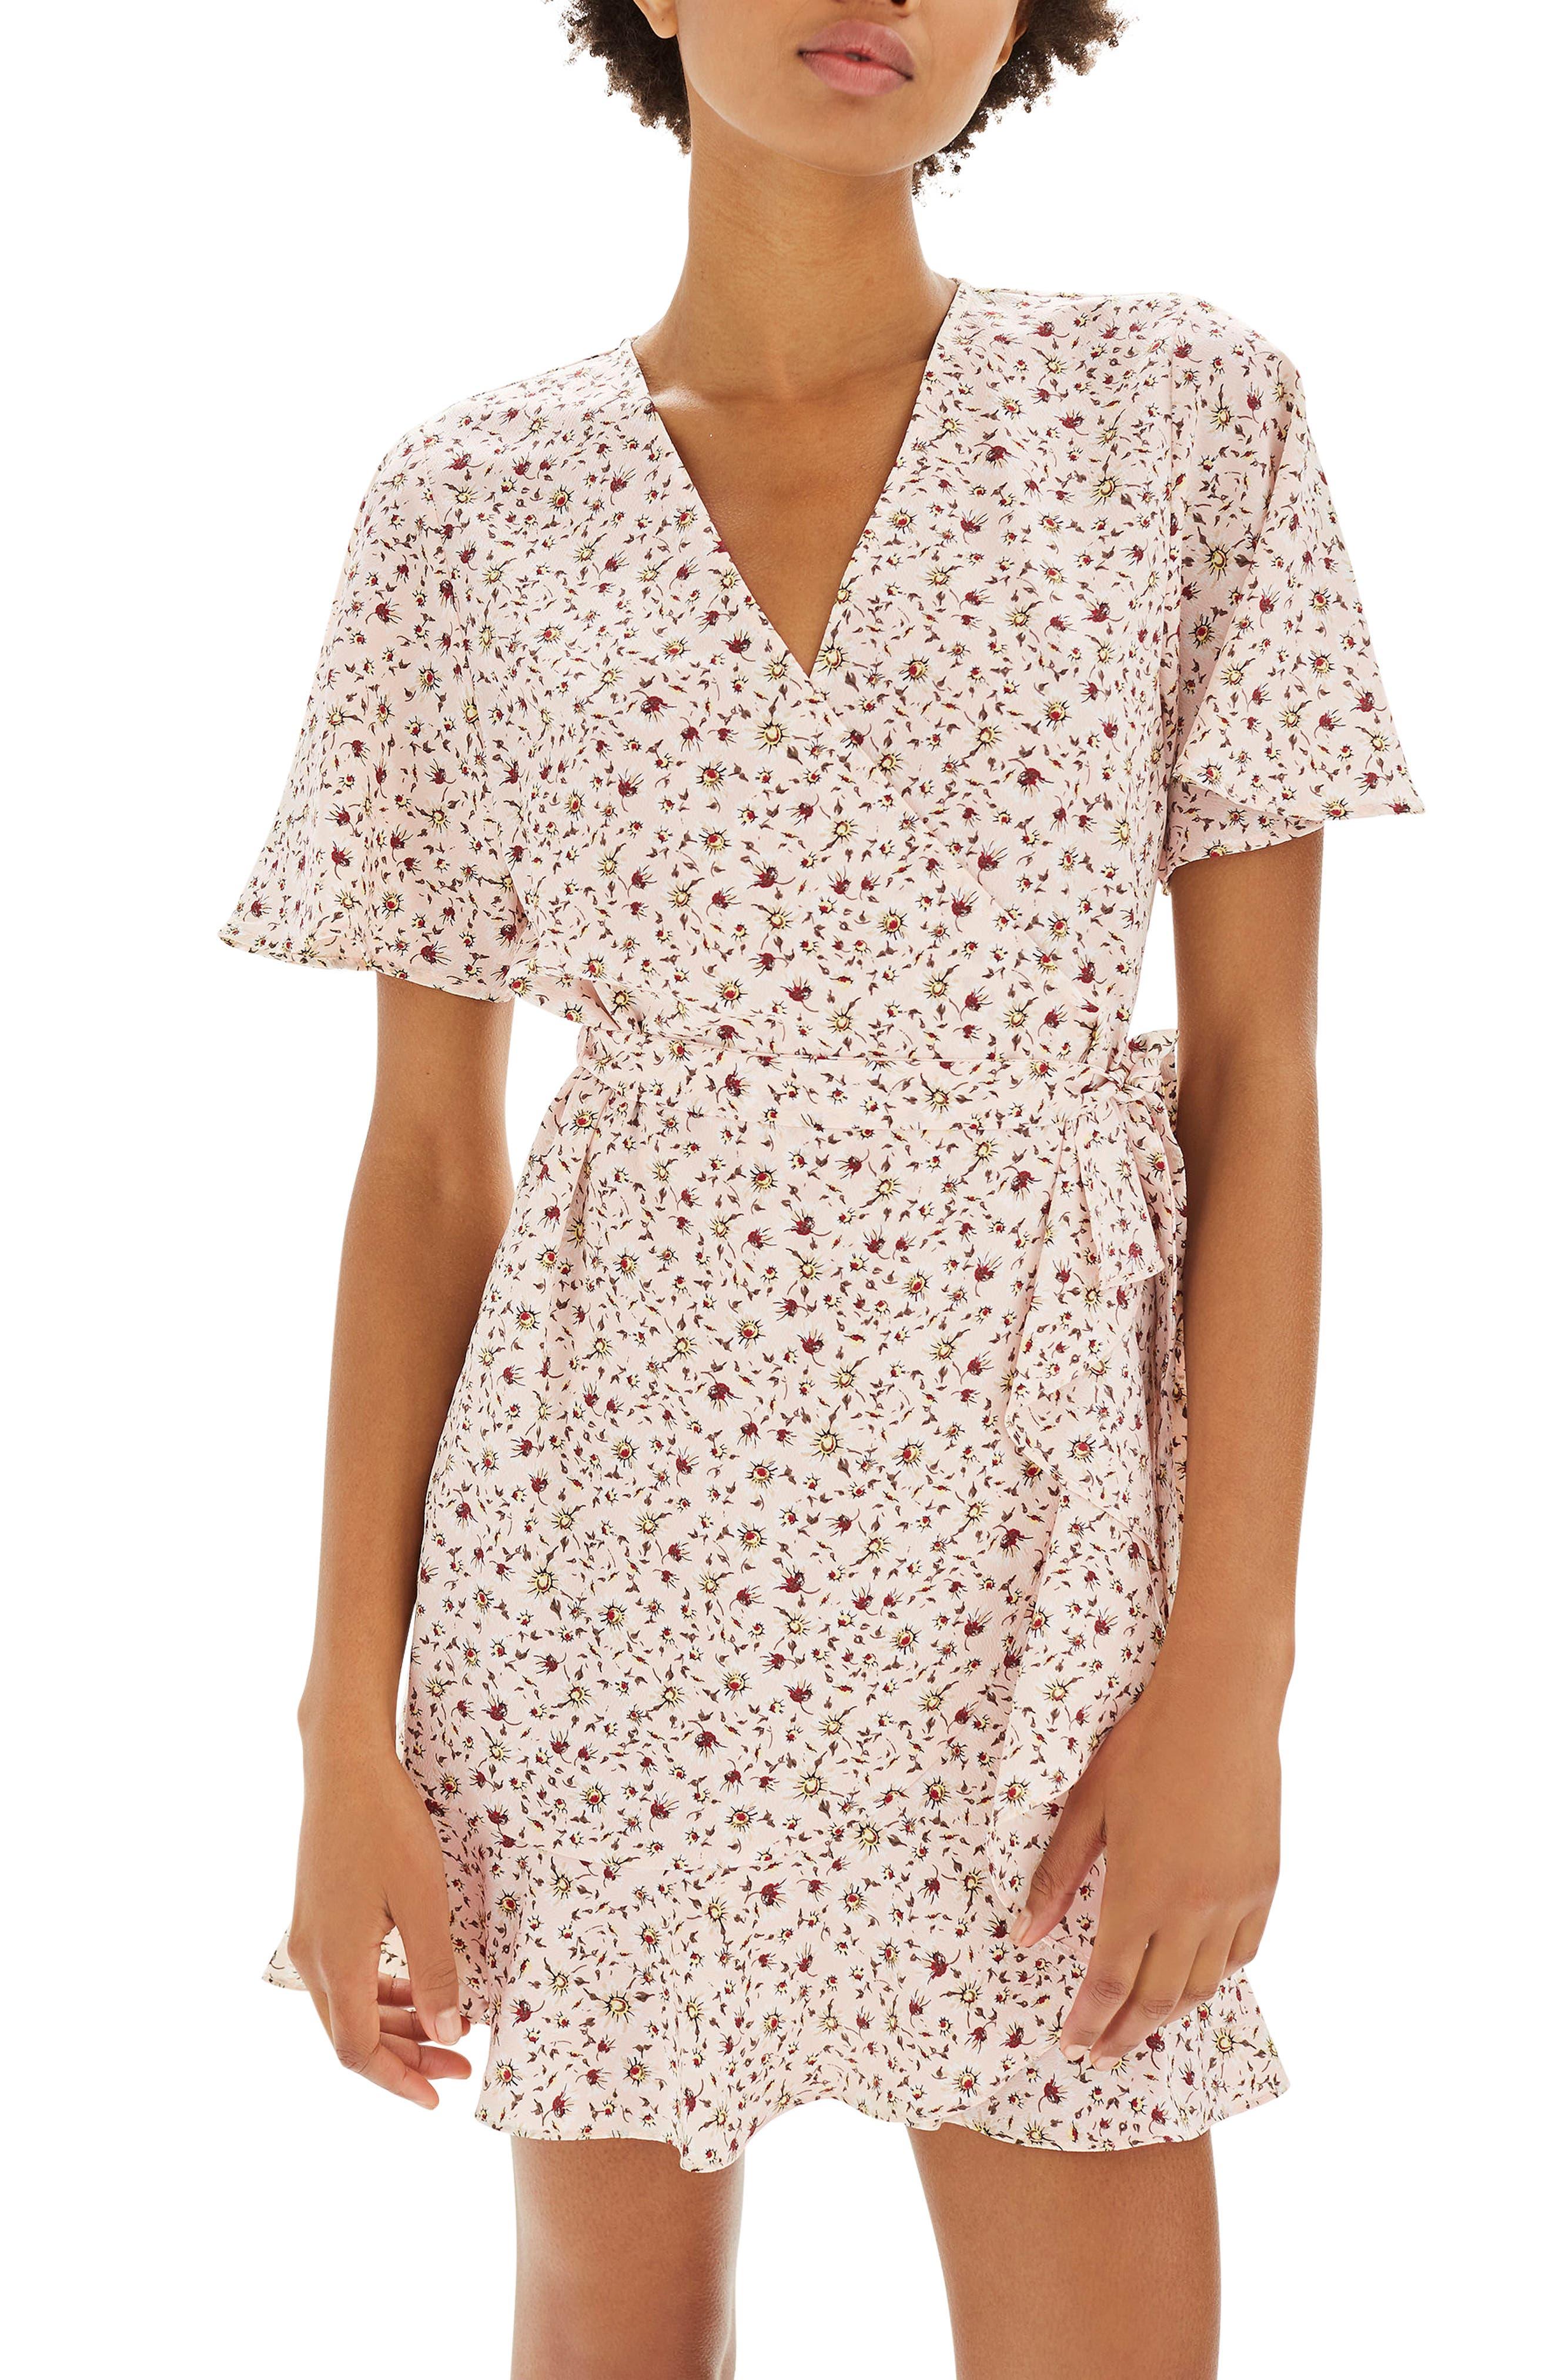 Topshop Daisy Ruffle Wrap Tea Dress